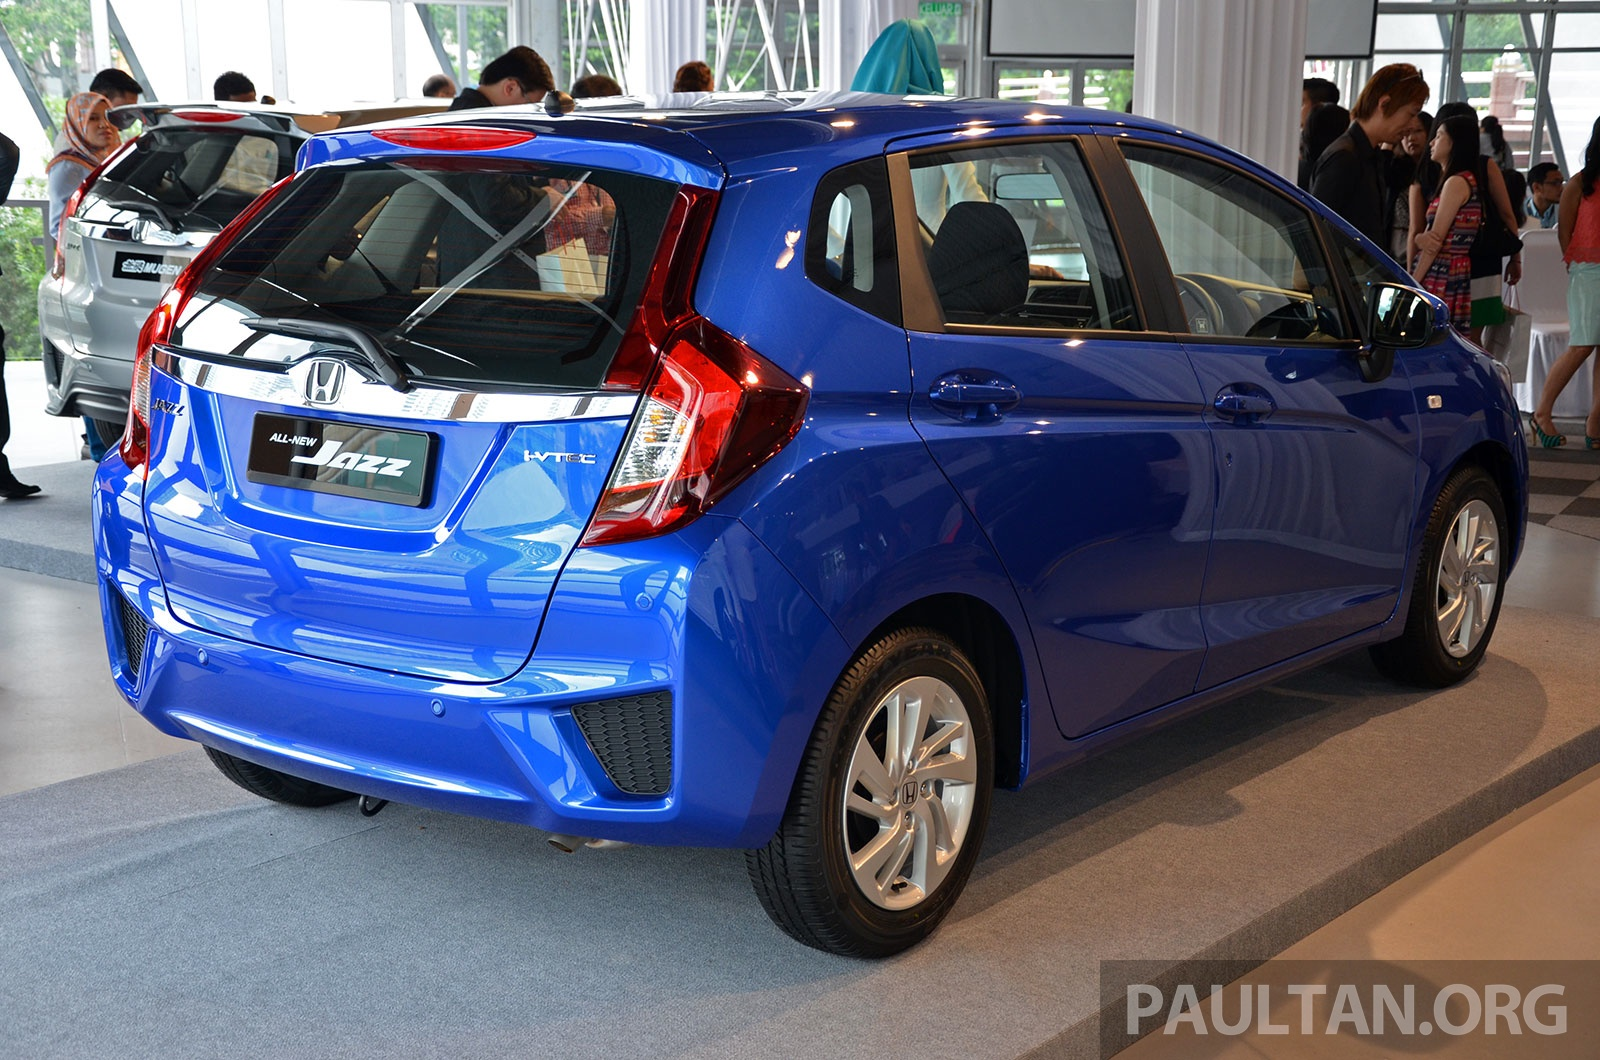 new car release in malaysia 2014New Honda Jazz 2014 Malaysia Price  CFA Vauban du Btiment